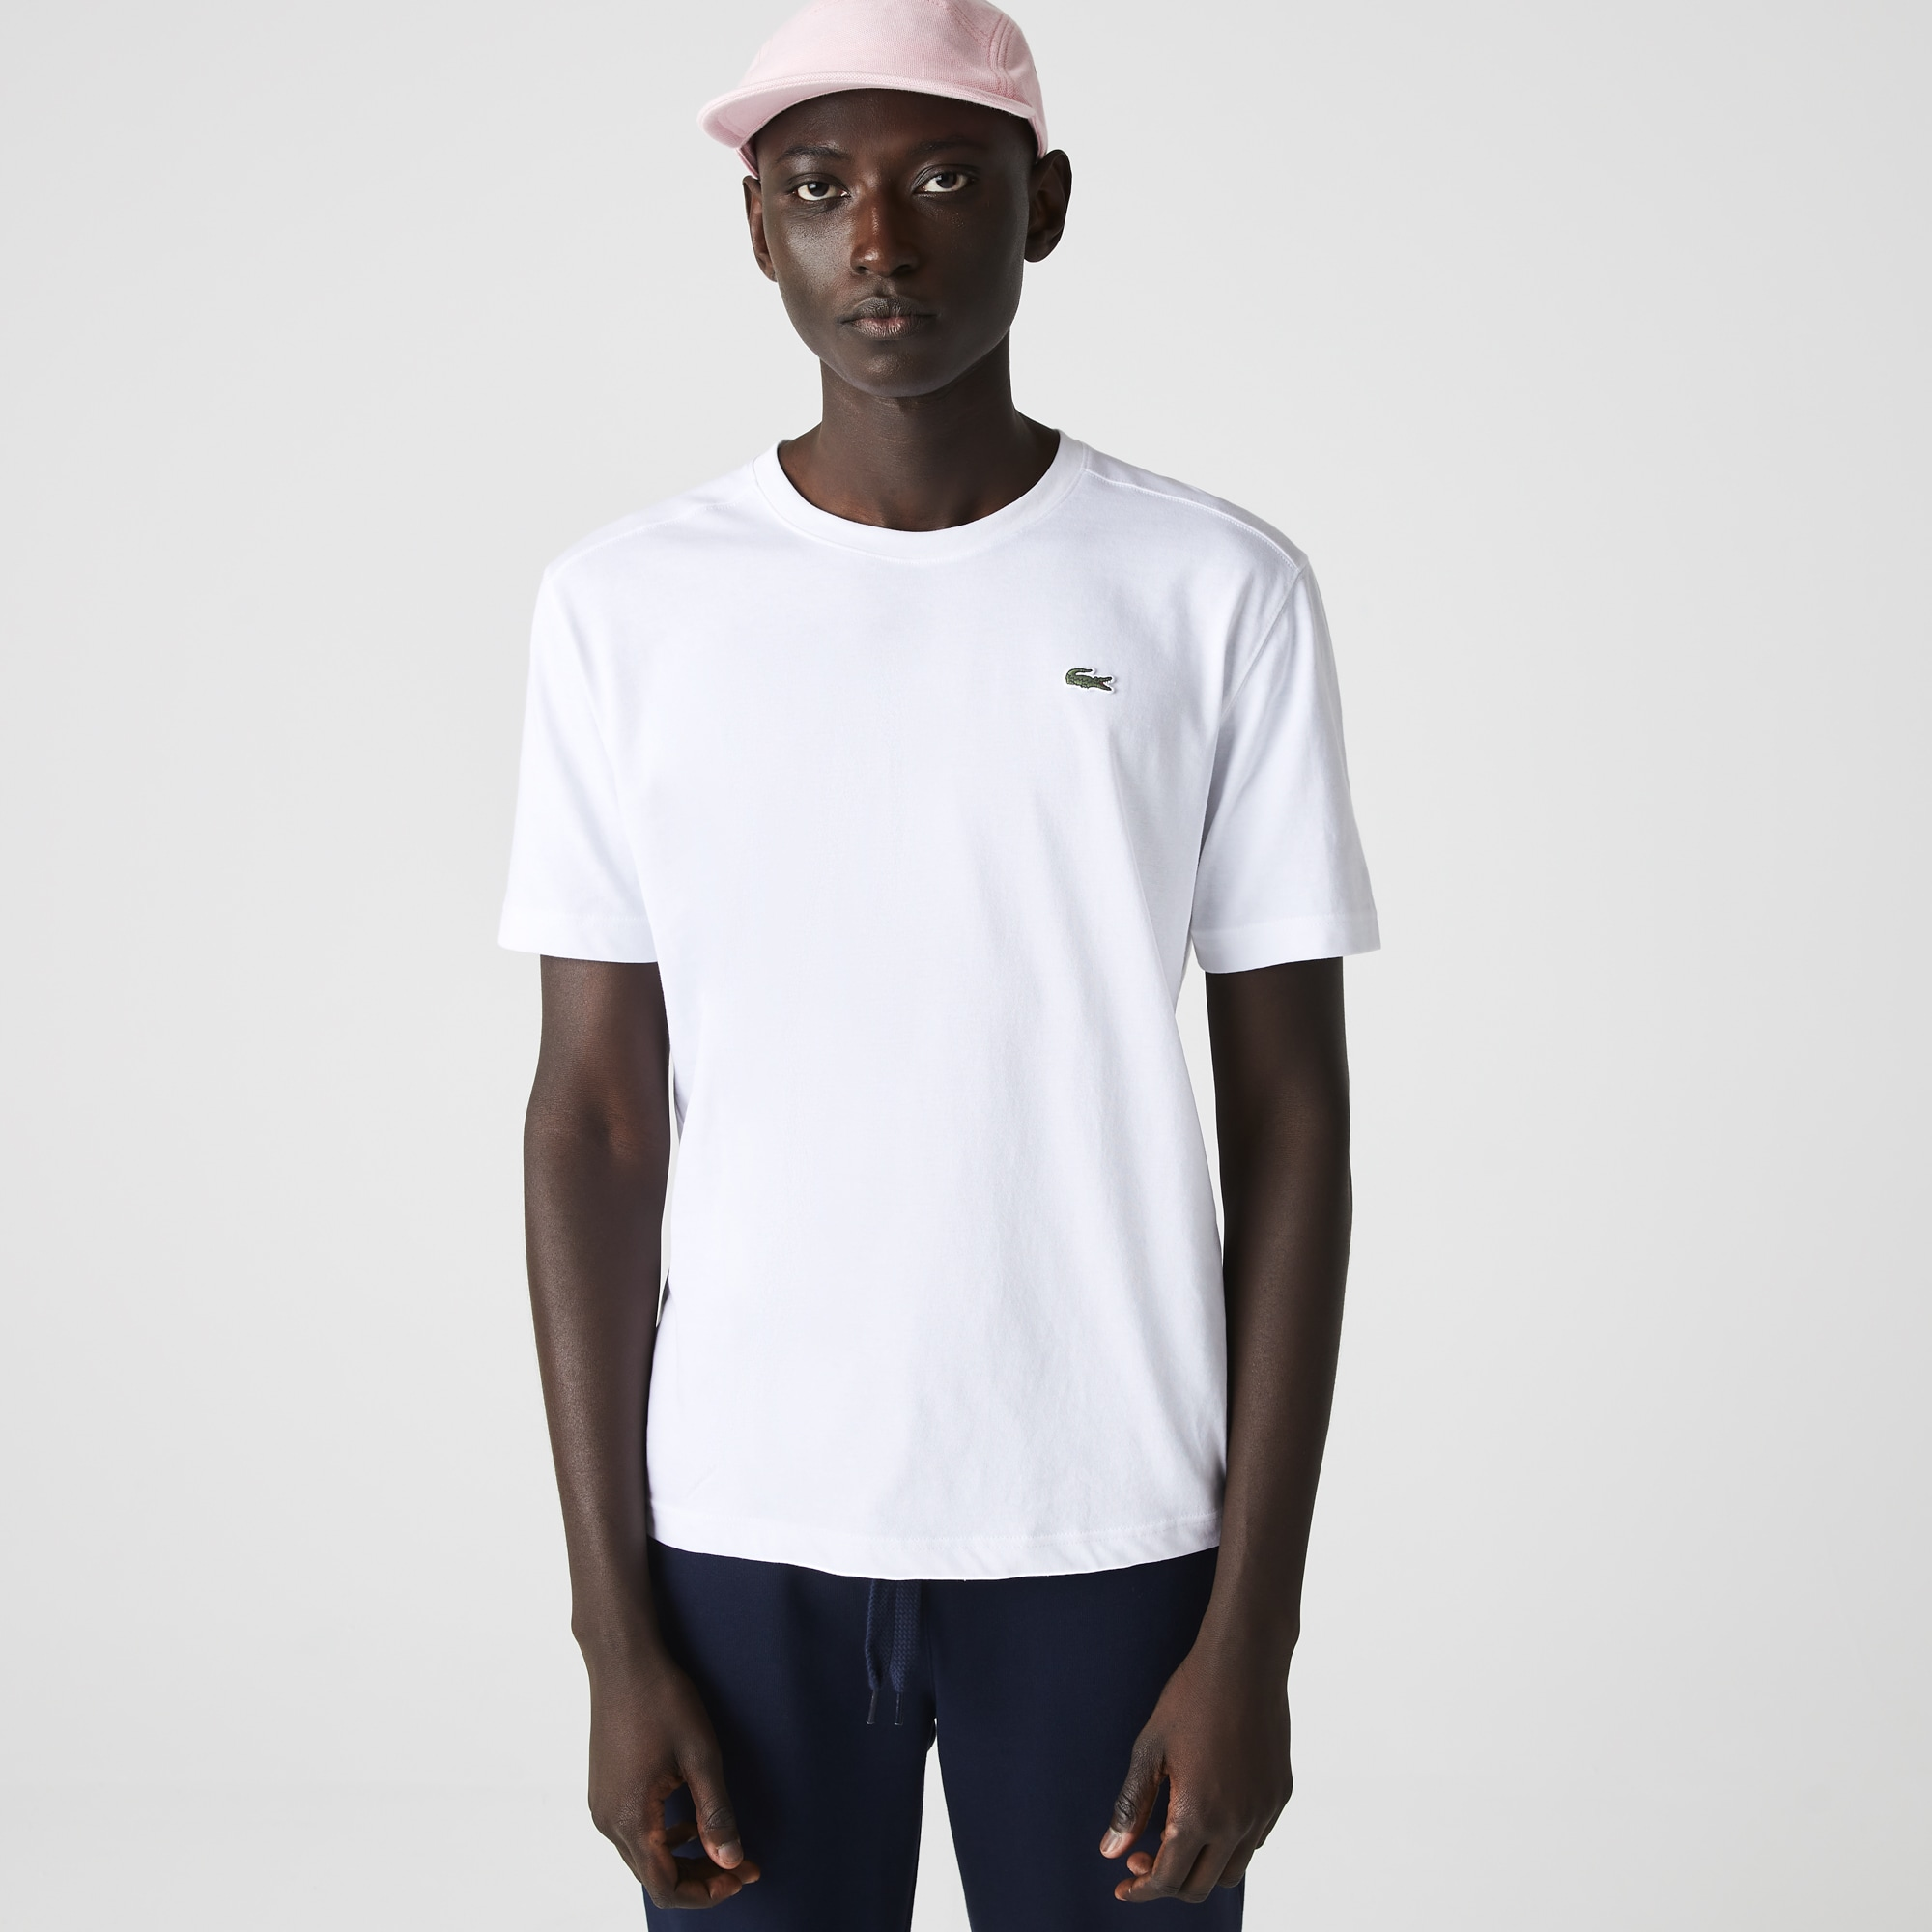 Camiseta gola careca Lacoste SPORT de jersey tecnológico liso